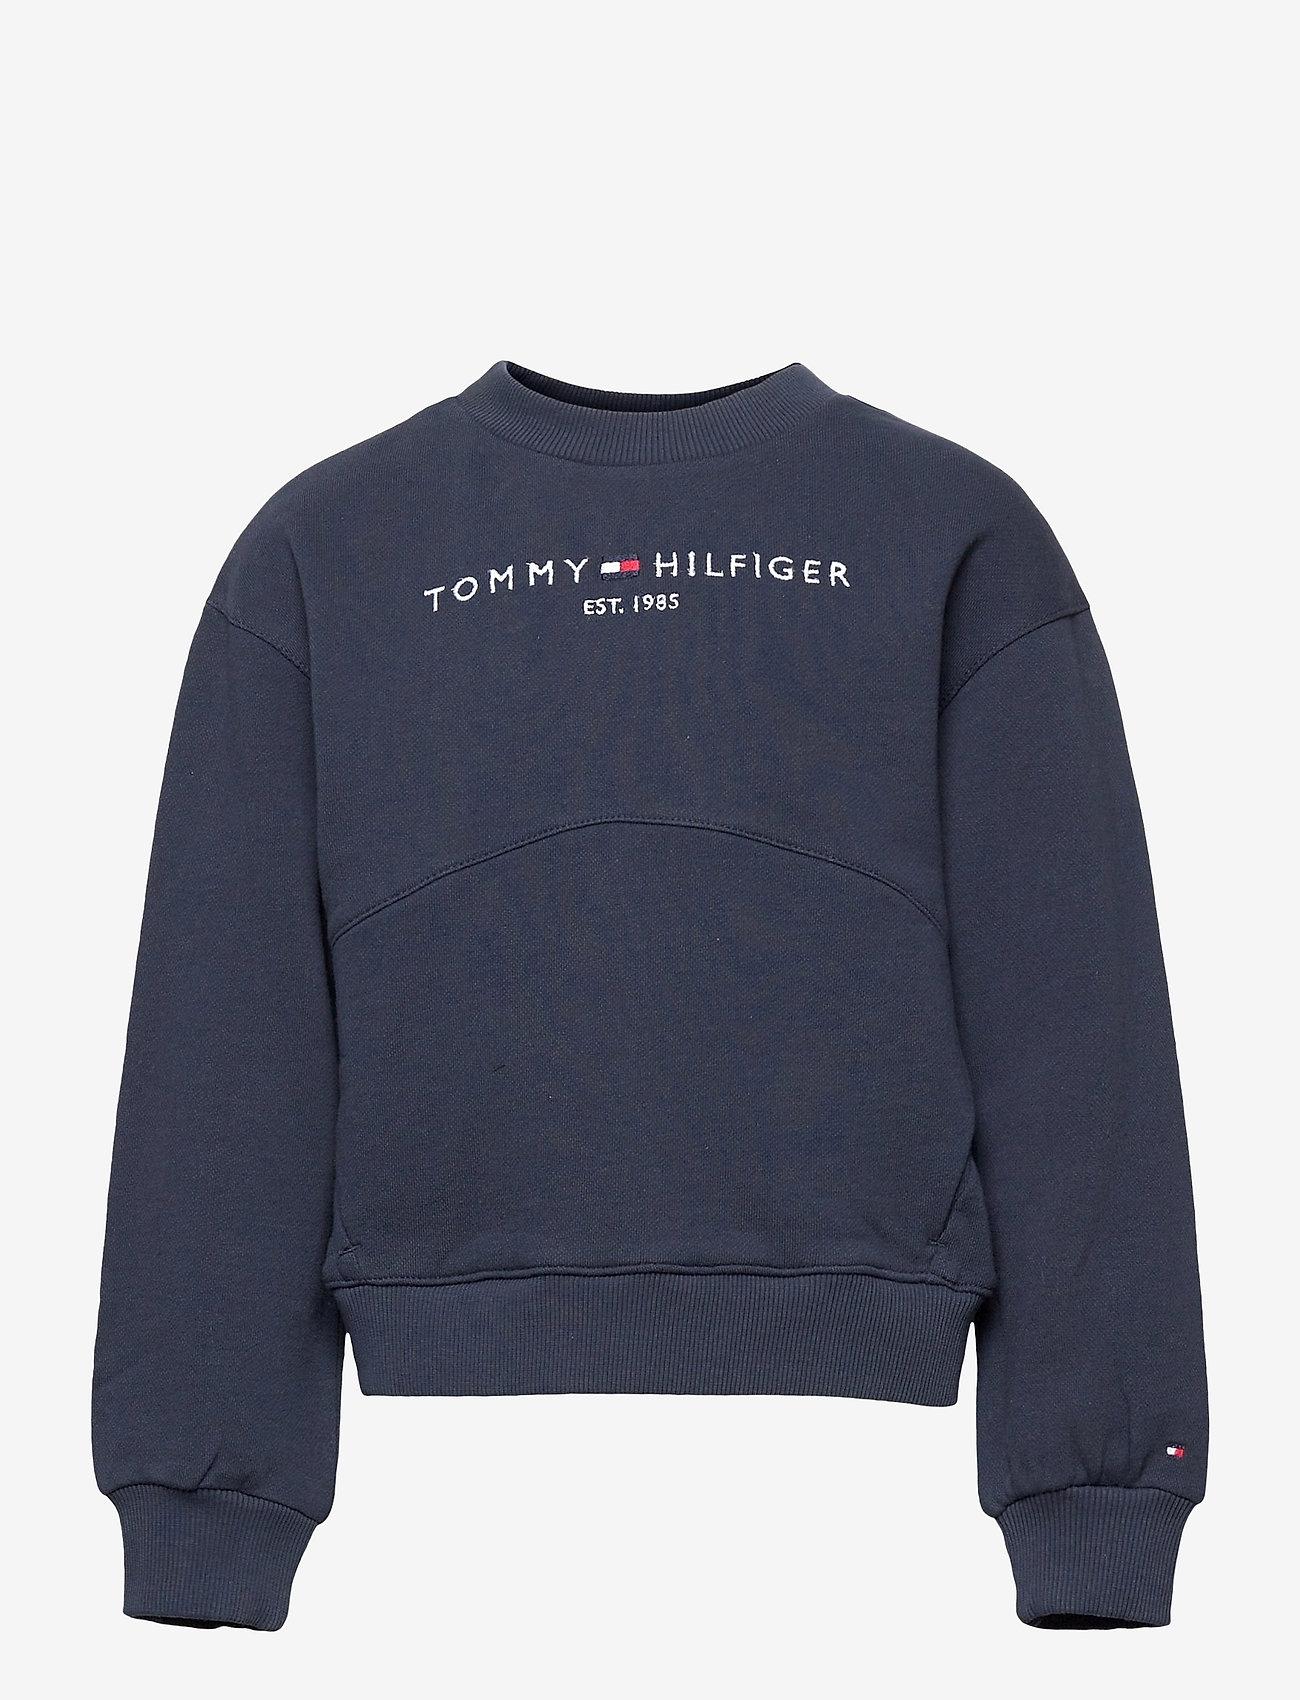 Tommy Hilfiger - ESSENTIAL SWEATSHIRT - sweatshirts - twilight navy - 0